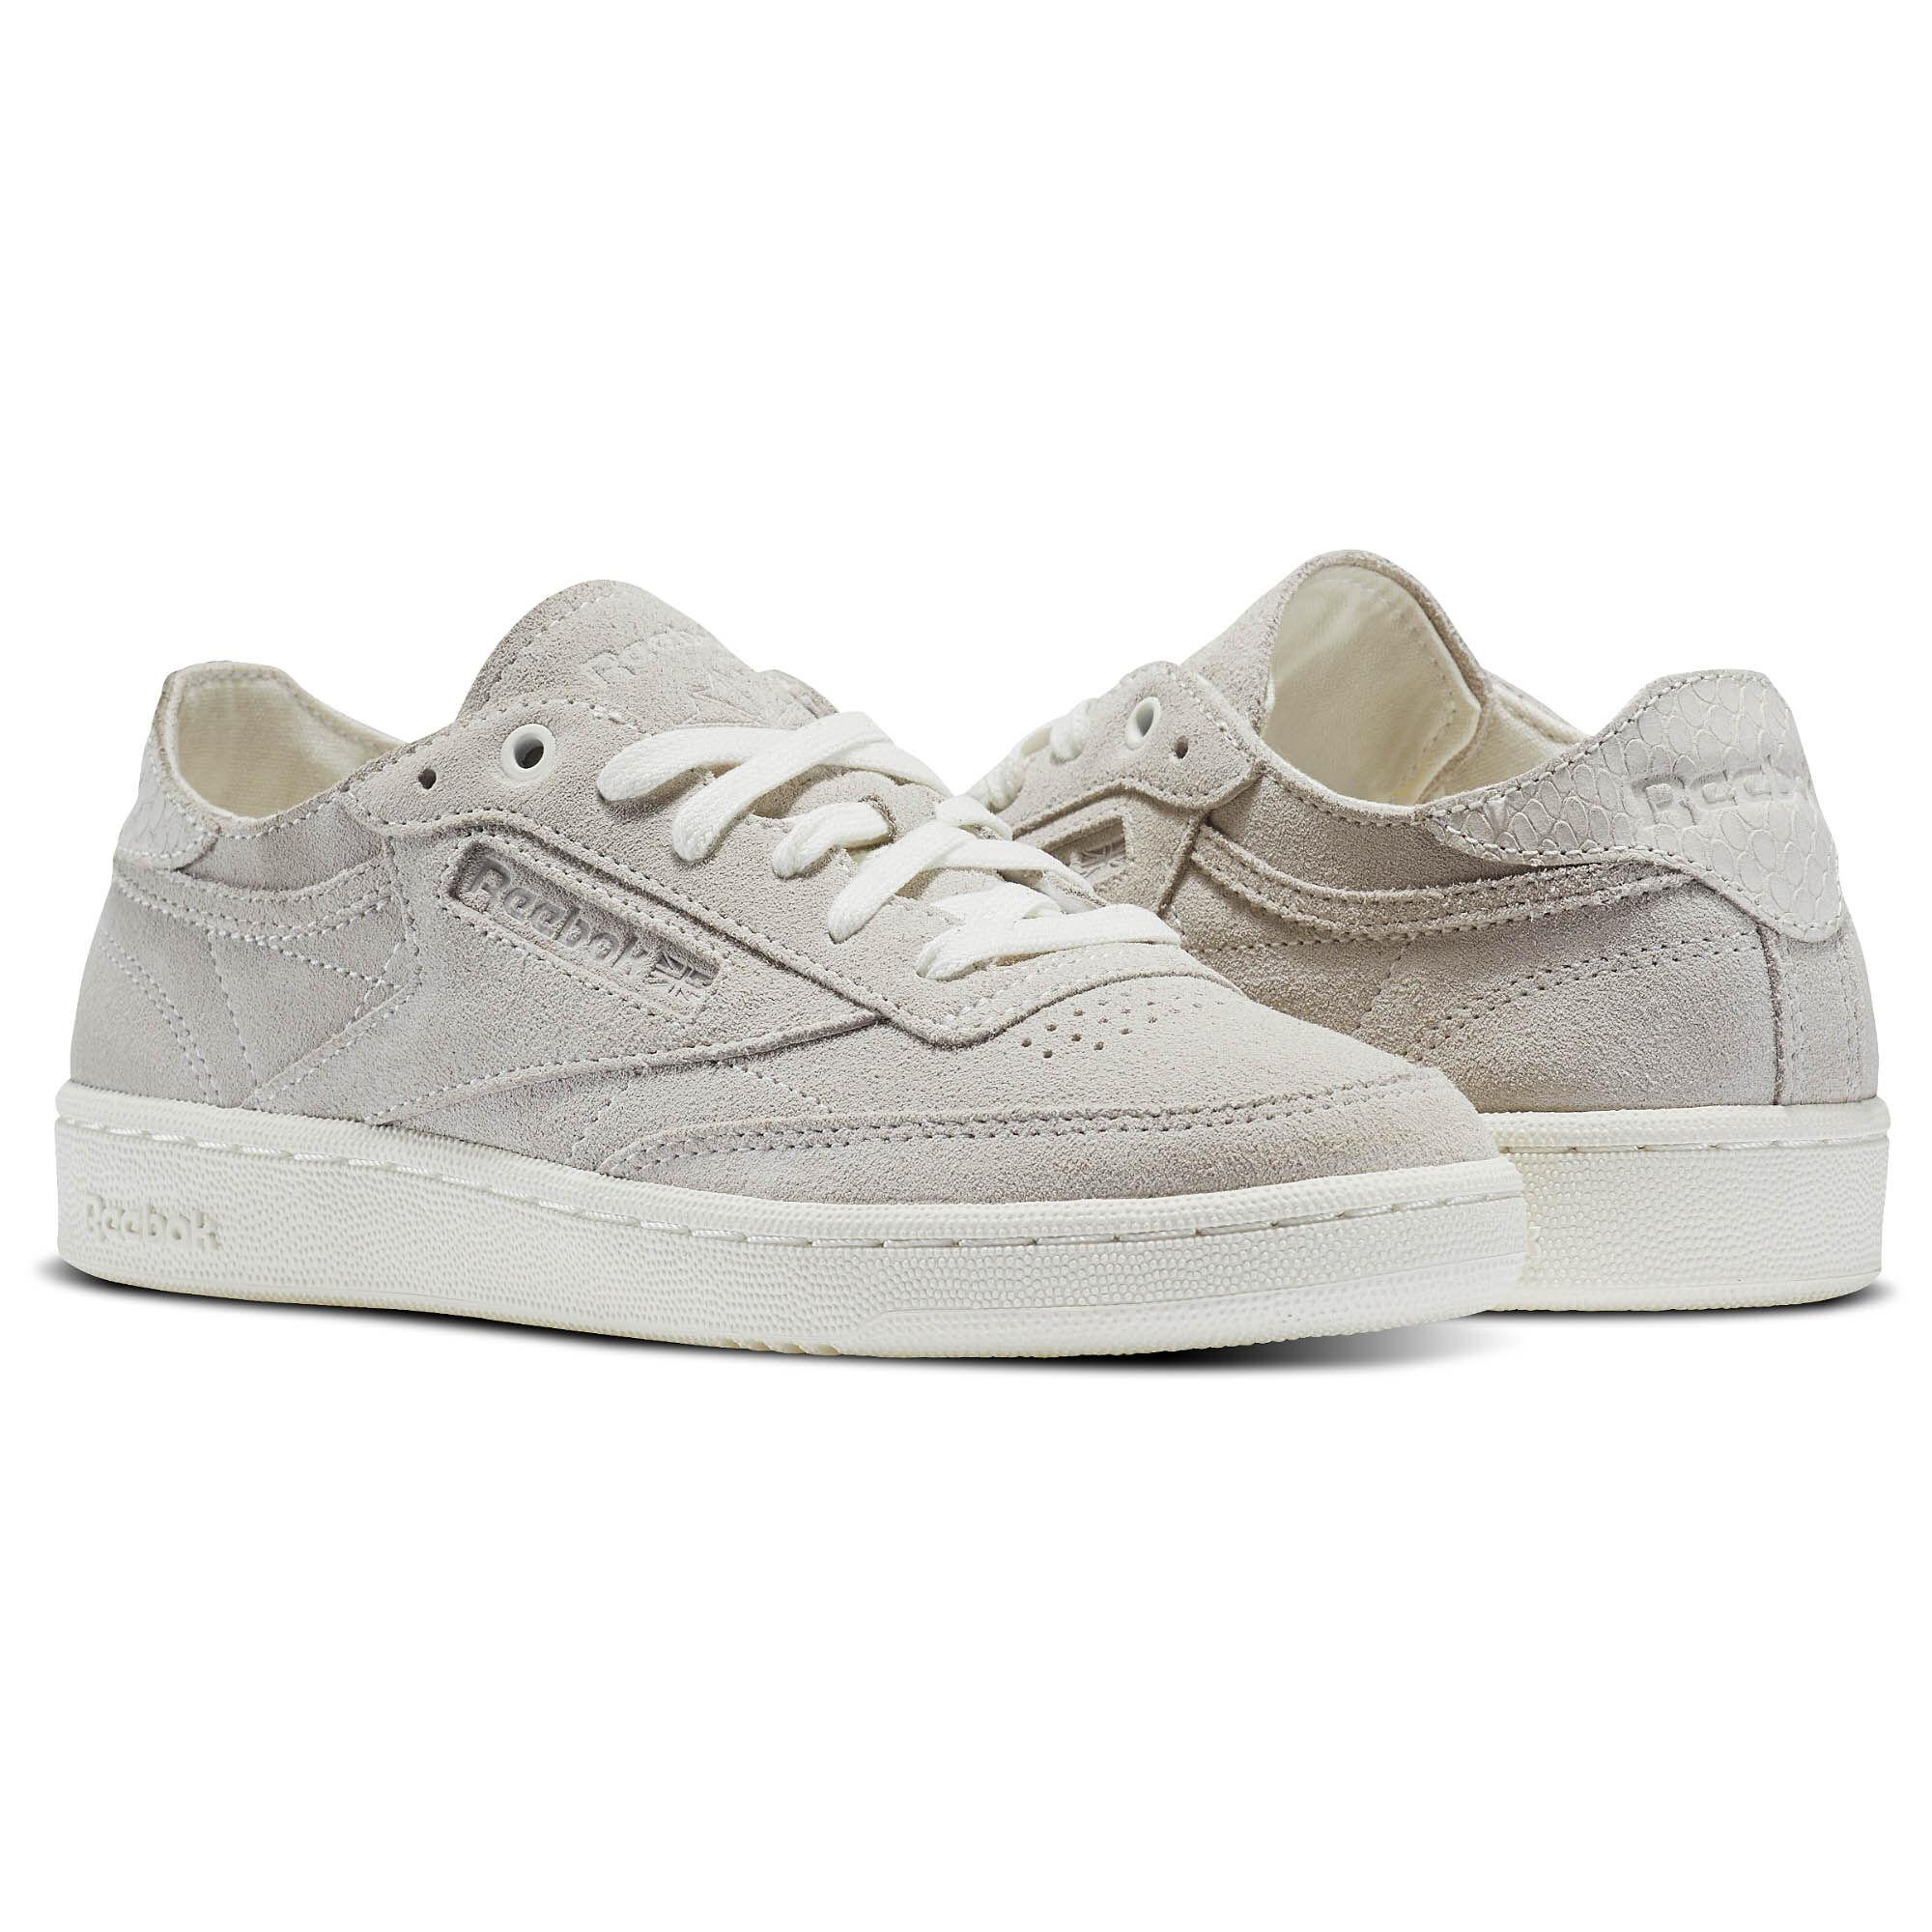 Mens Shoes Reebok CLub C85 SG Hunter Green BS7890